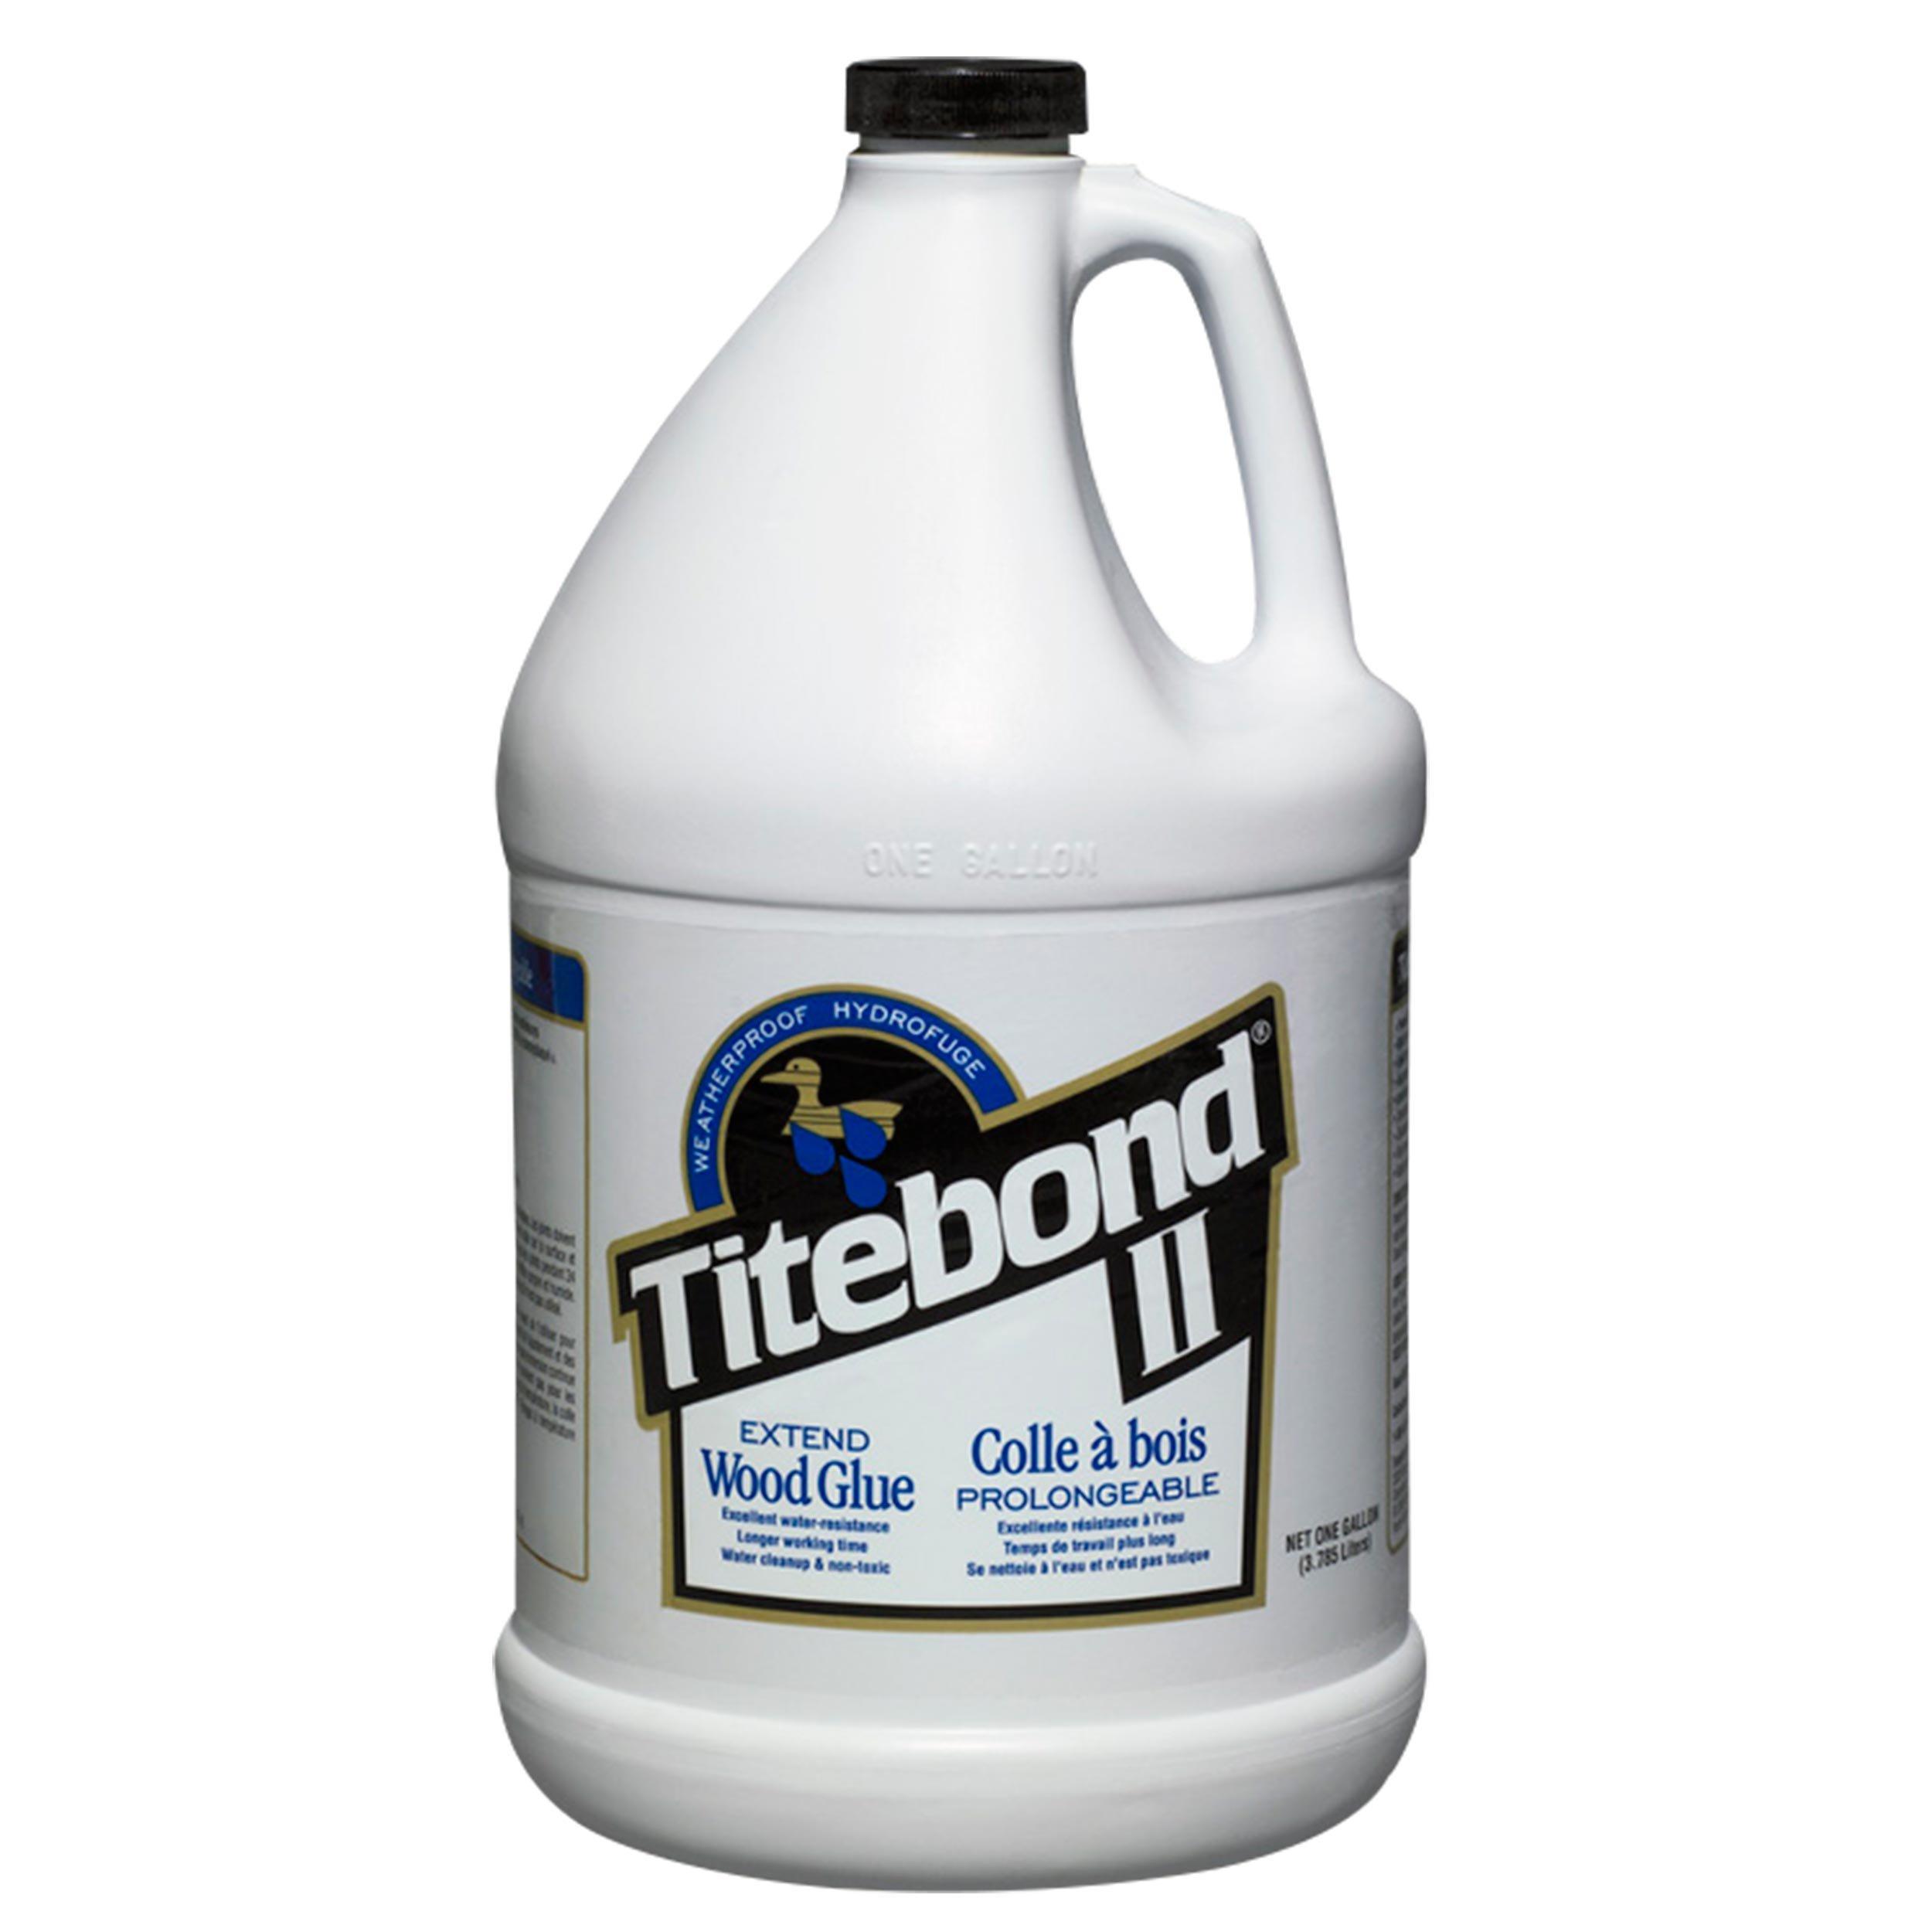 Titebond II Extend, Gallon